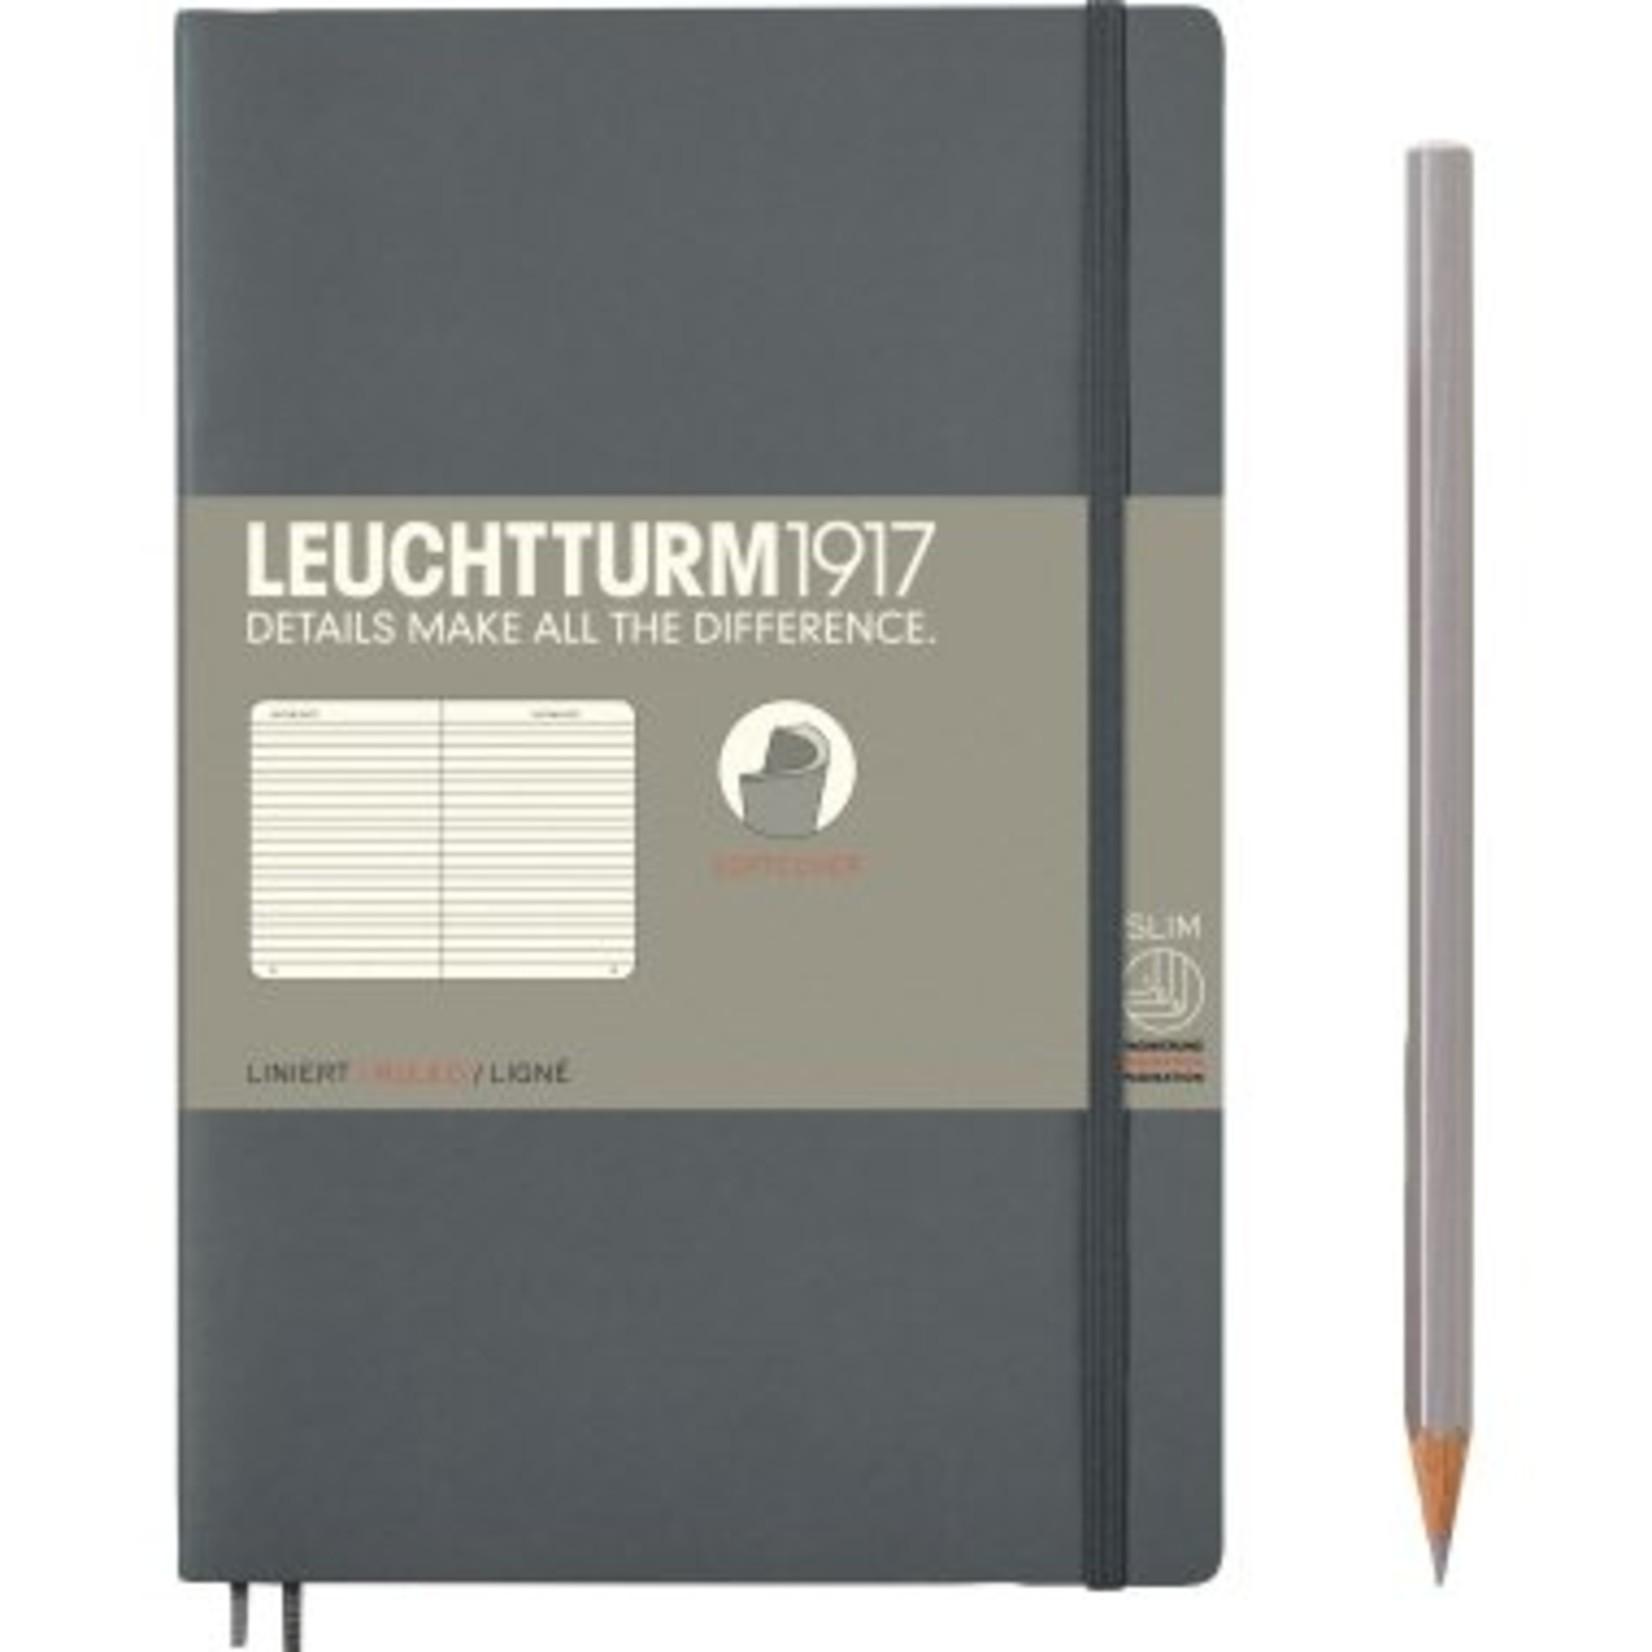 Leuchtturm1917 LT NB B6 SC Paperback Anthrazit Liniert